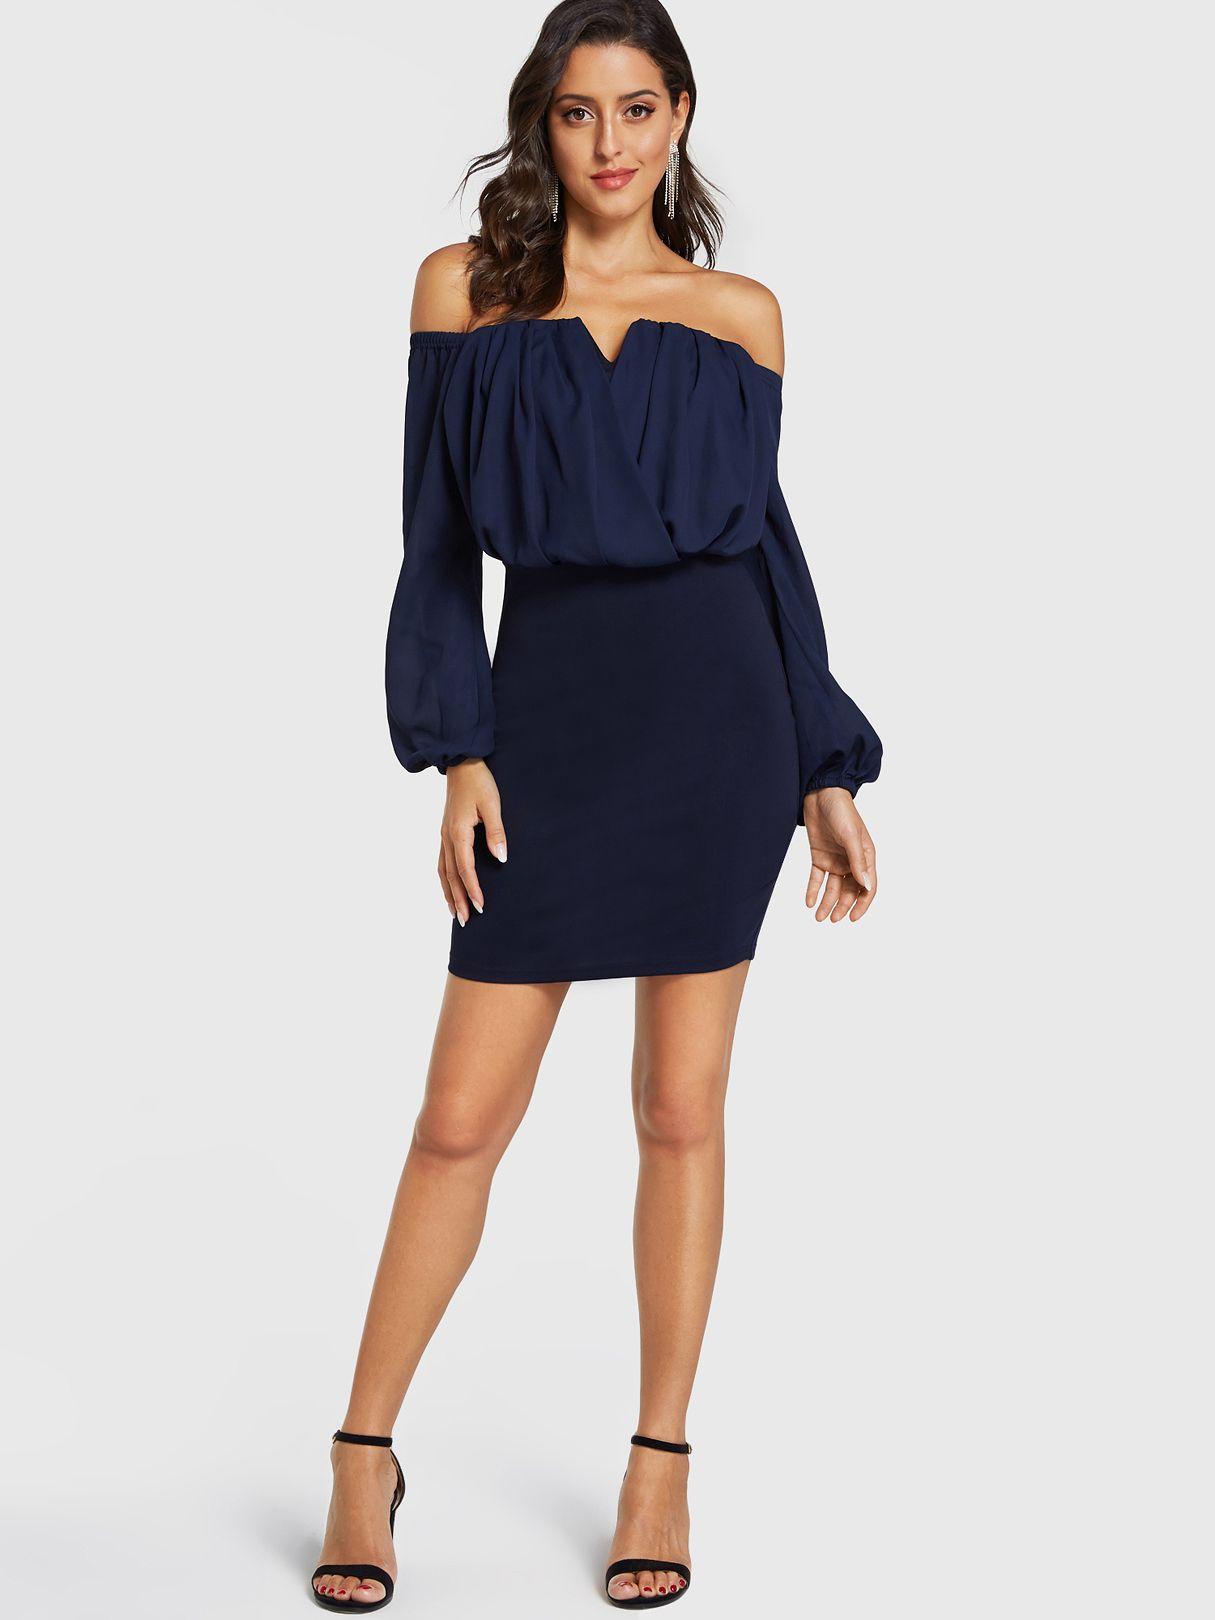 Pin On Womens Fashion Dress [ 1620 x 1215 Pixel ]